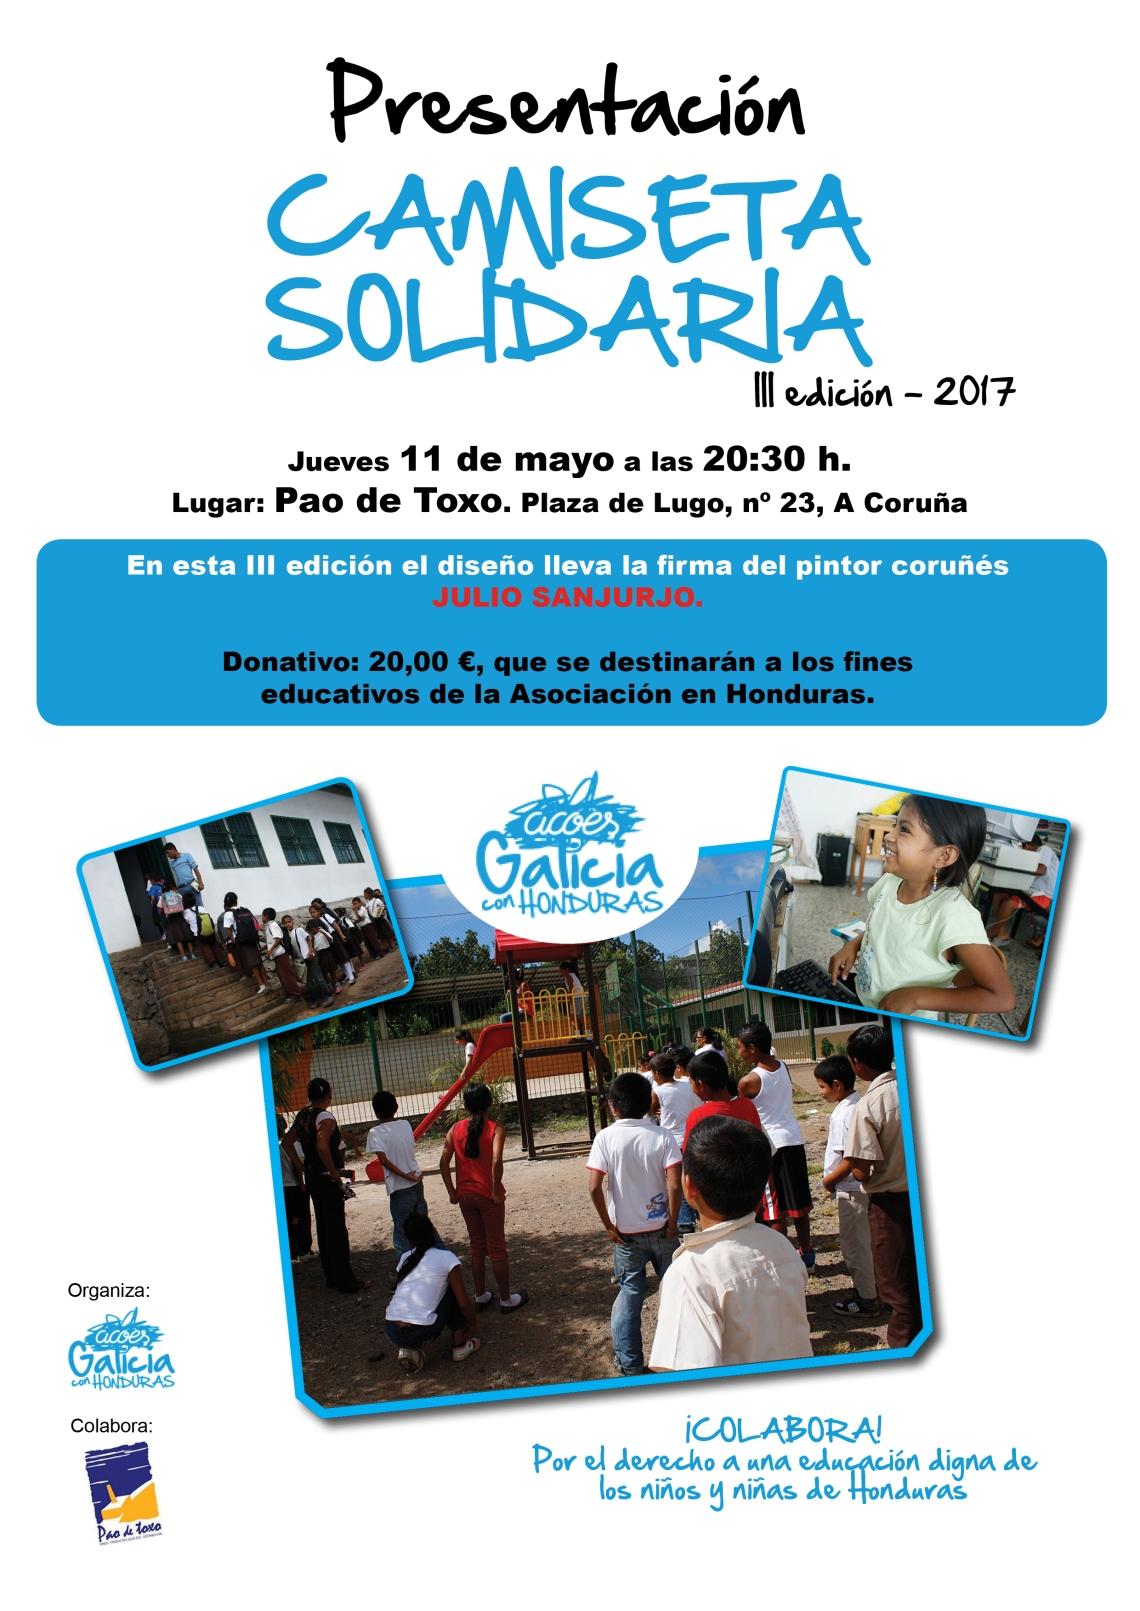 Presentacion Camiseta Solidaria 2017_web.jpg